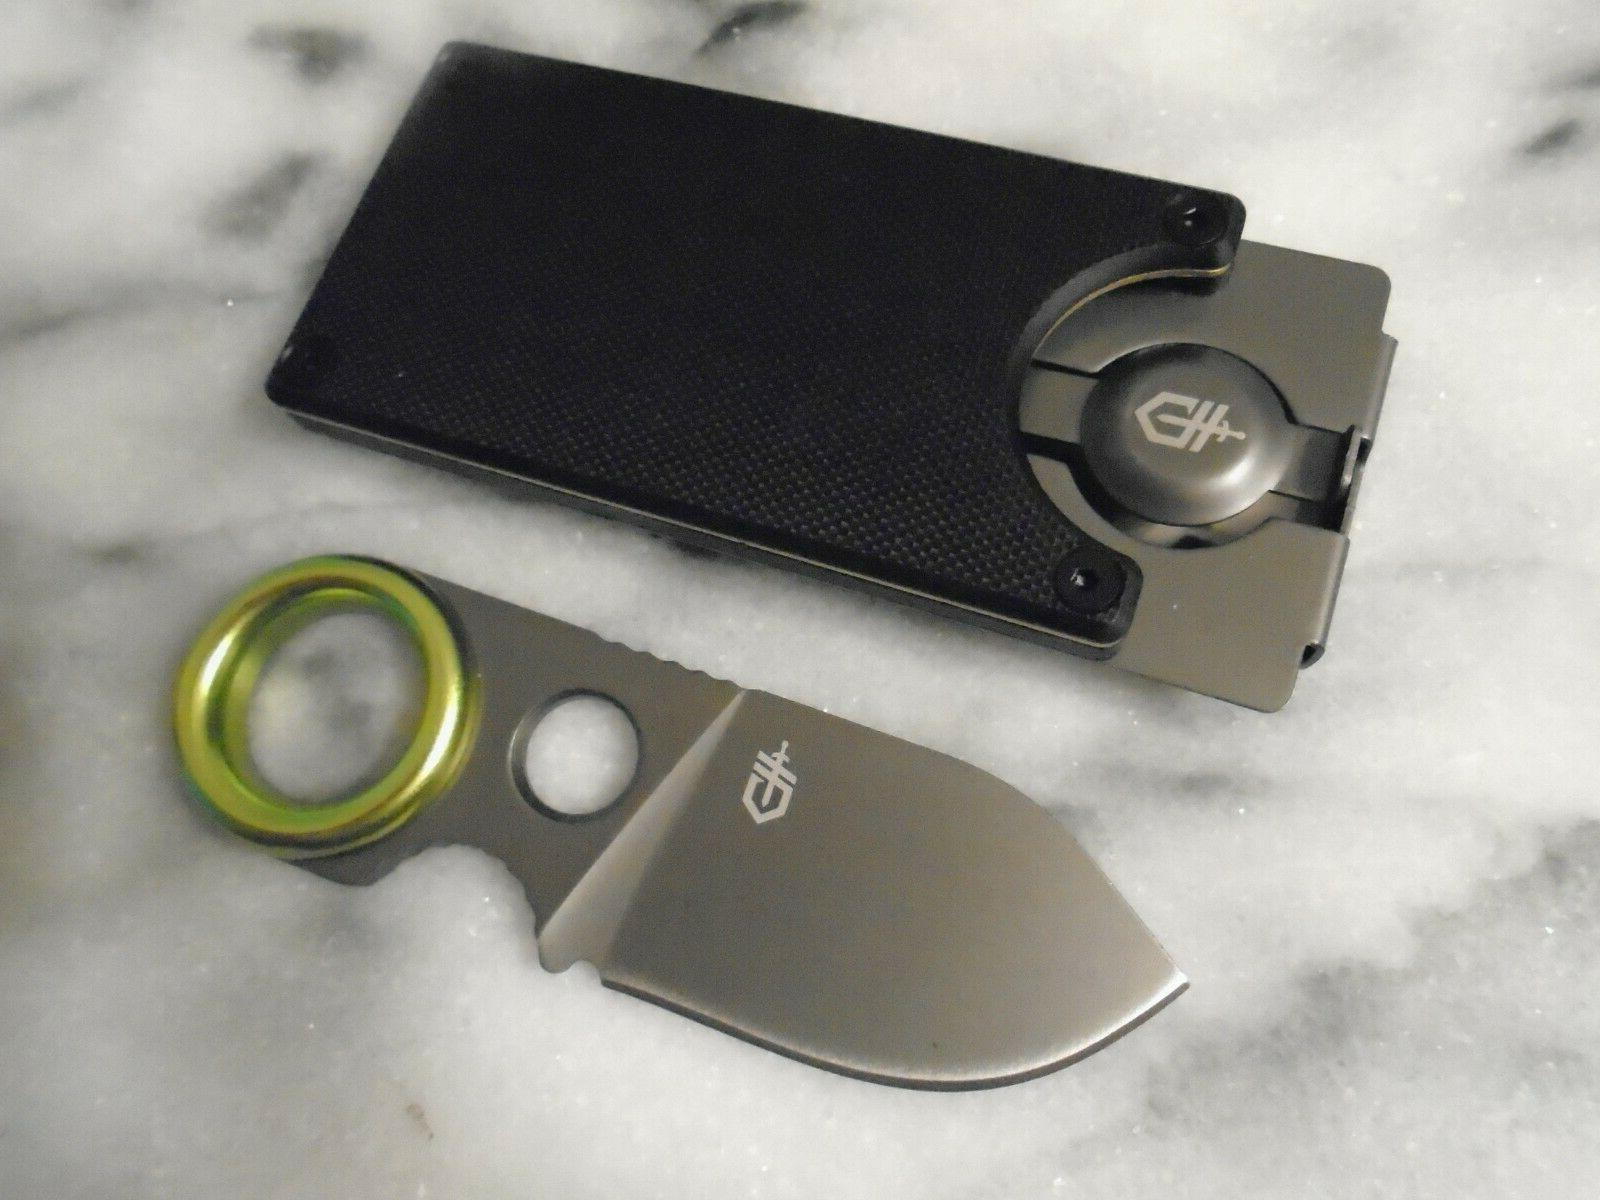 Gerber Clip Fixed Blade Full Tang OA